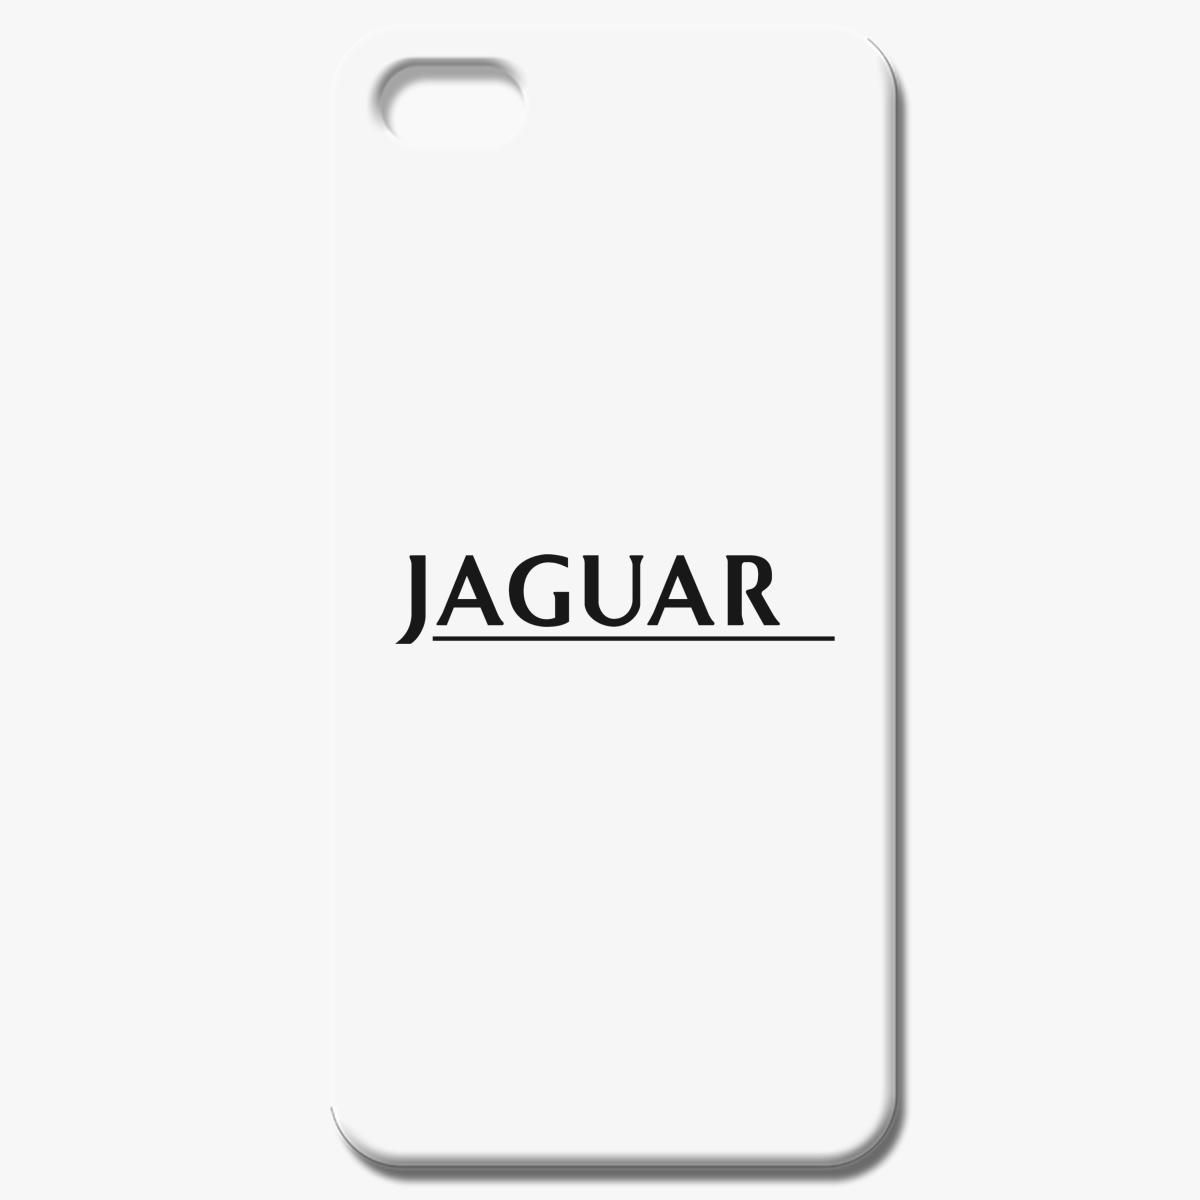 Jaguar Iphone 8 Case